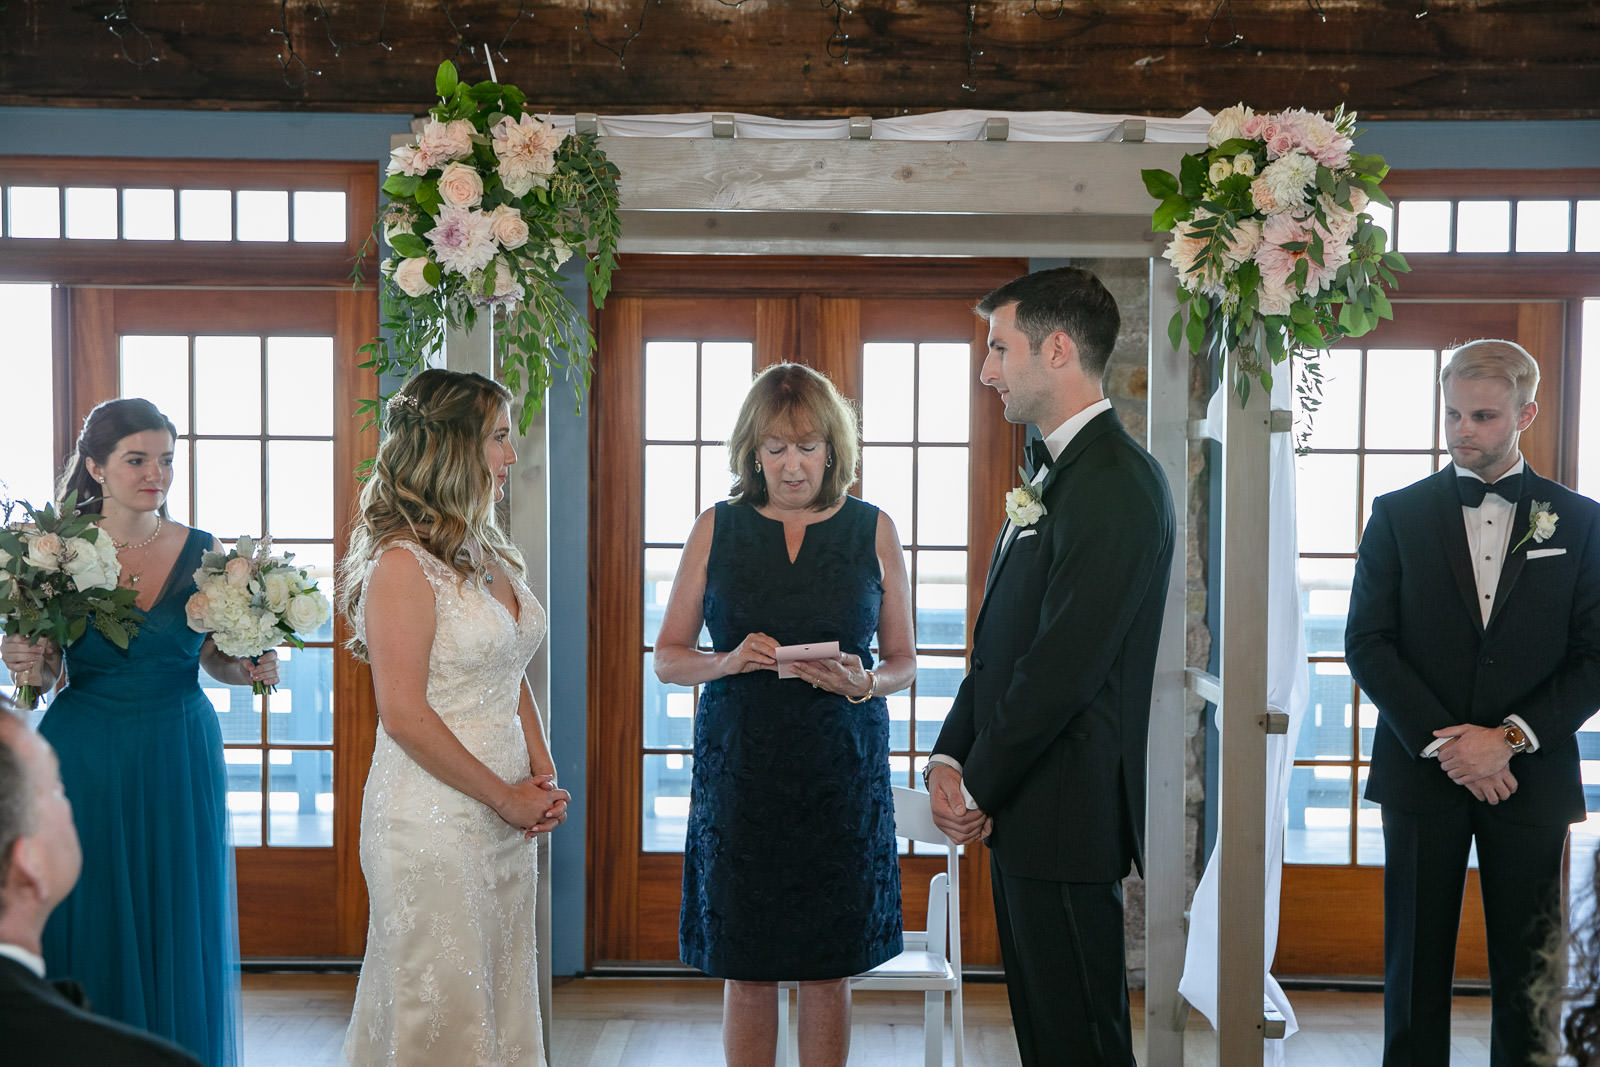 Wedding, Narragansett Towers, The Towers, Narragansett, Rhode Island, RI, Tracy Jenkins photography, RI wedding photographer, Rhode Island wedding photographer, wedding ceremony